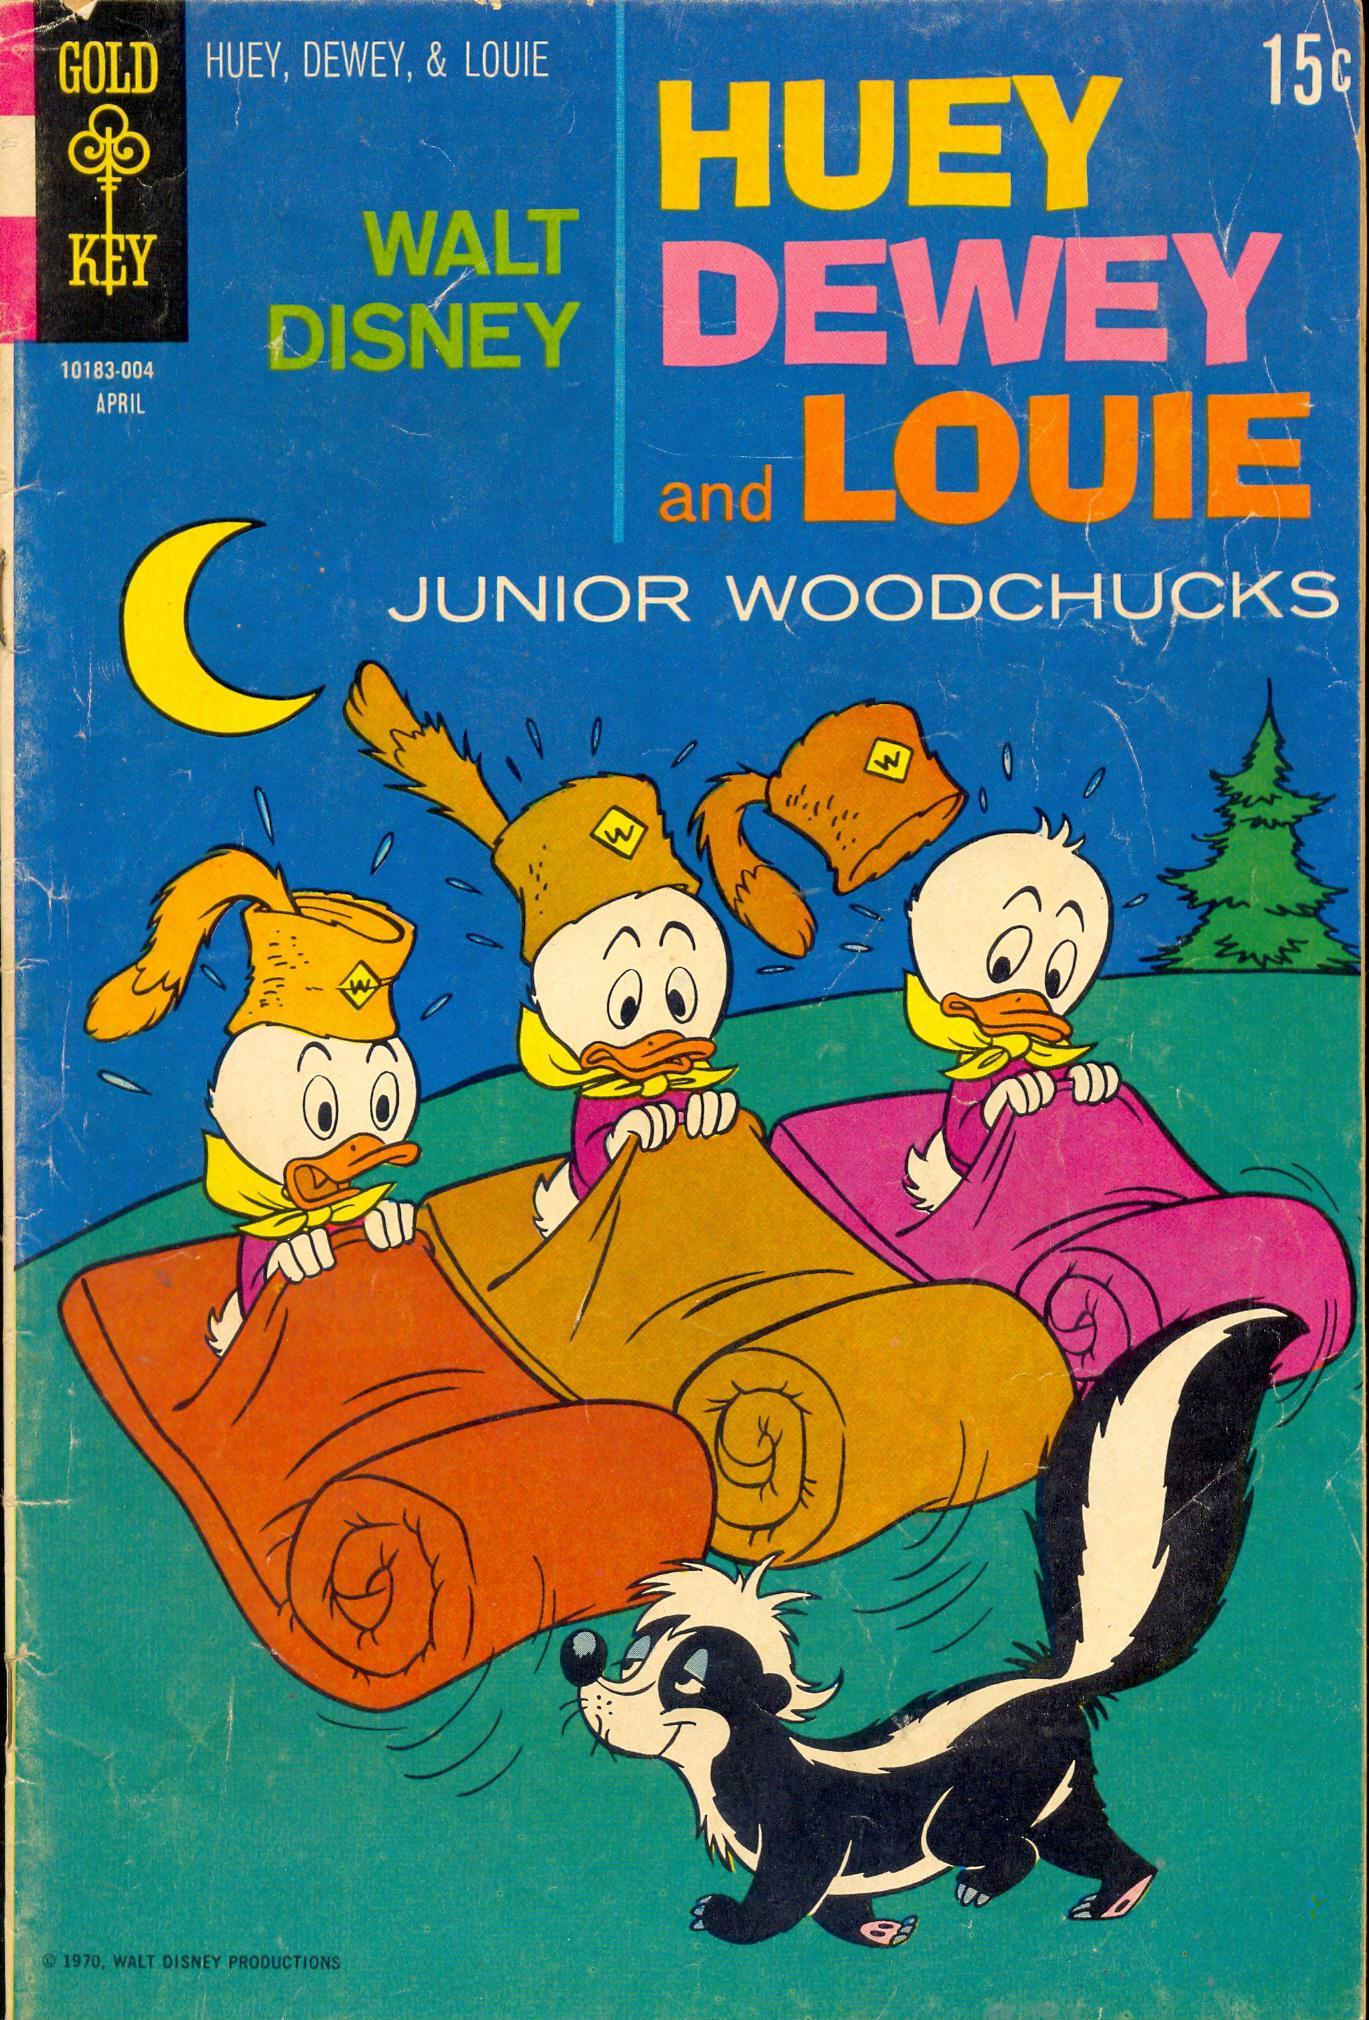 Huey, Dewey, and Louie Junior Woodchucks 5 Page 1